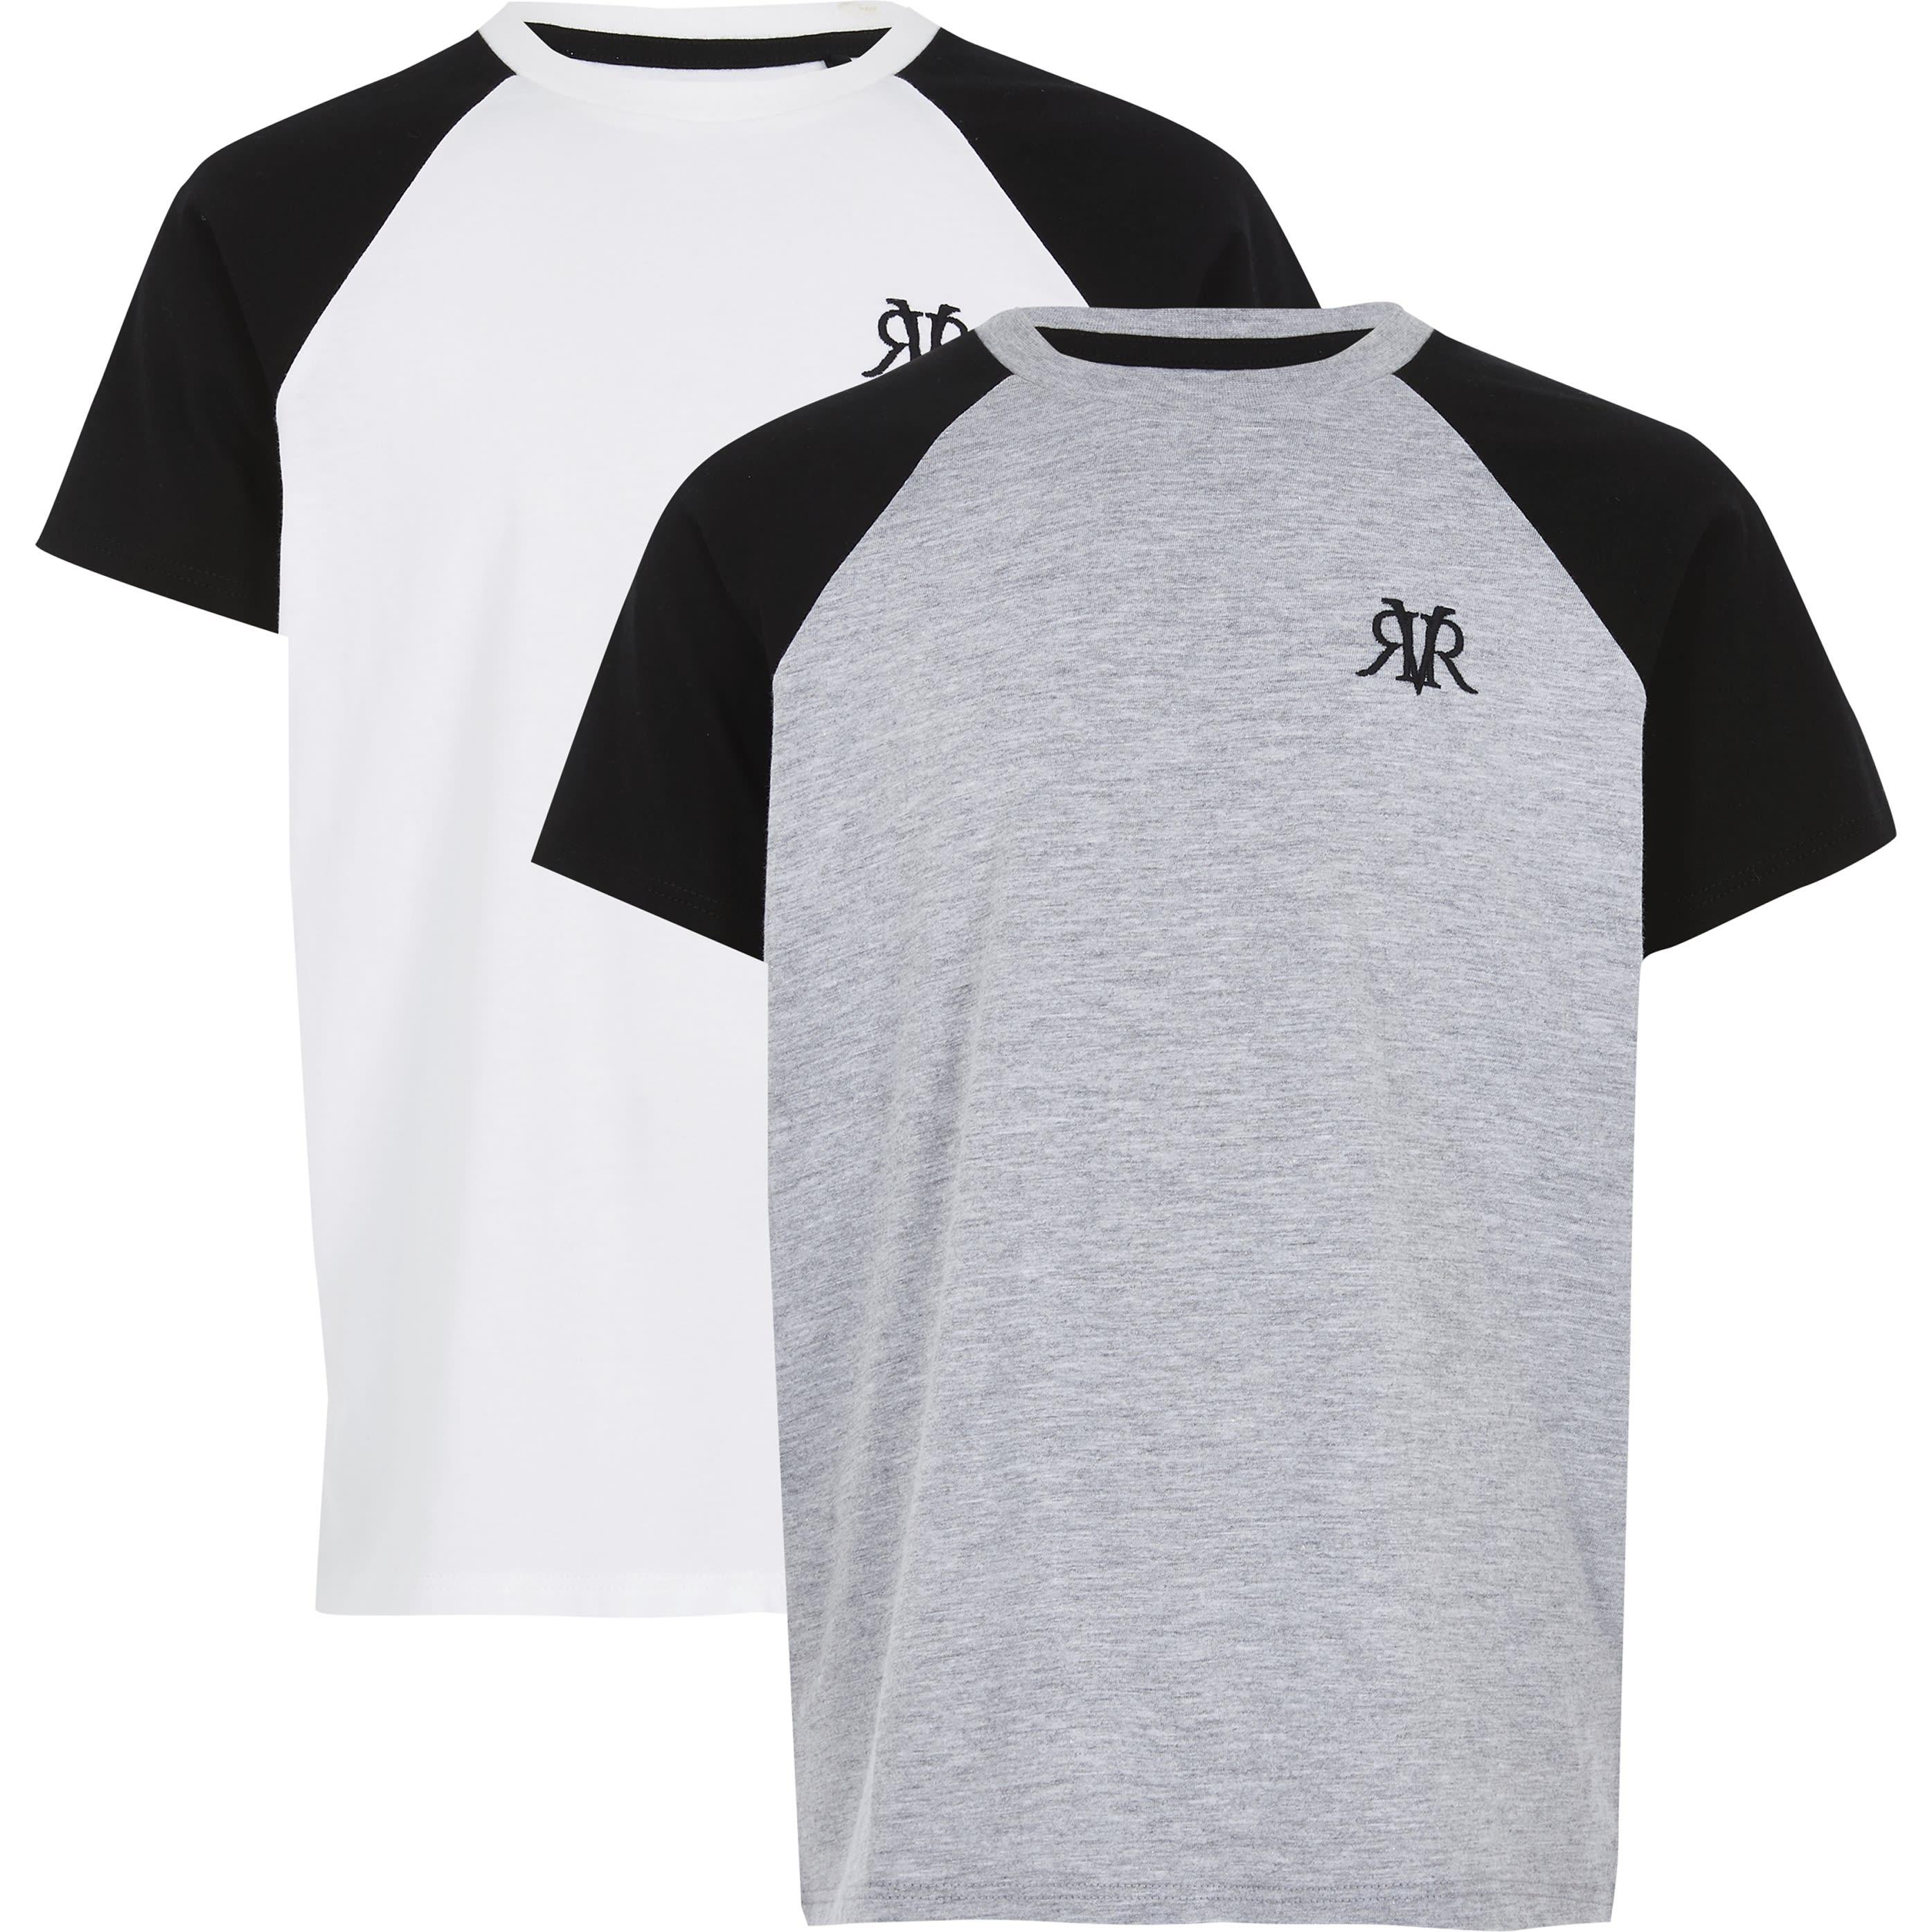 River Island Boys White RVR raglan T-shirt 2 pack (7-8 Yrs)